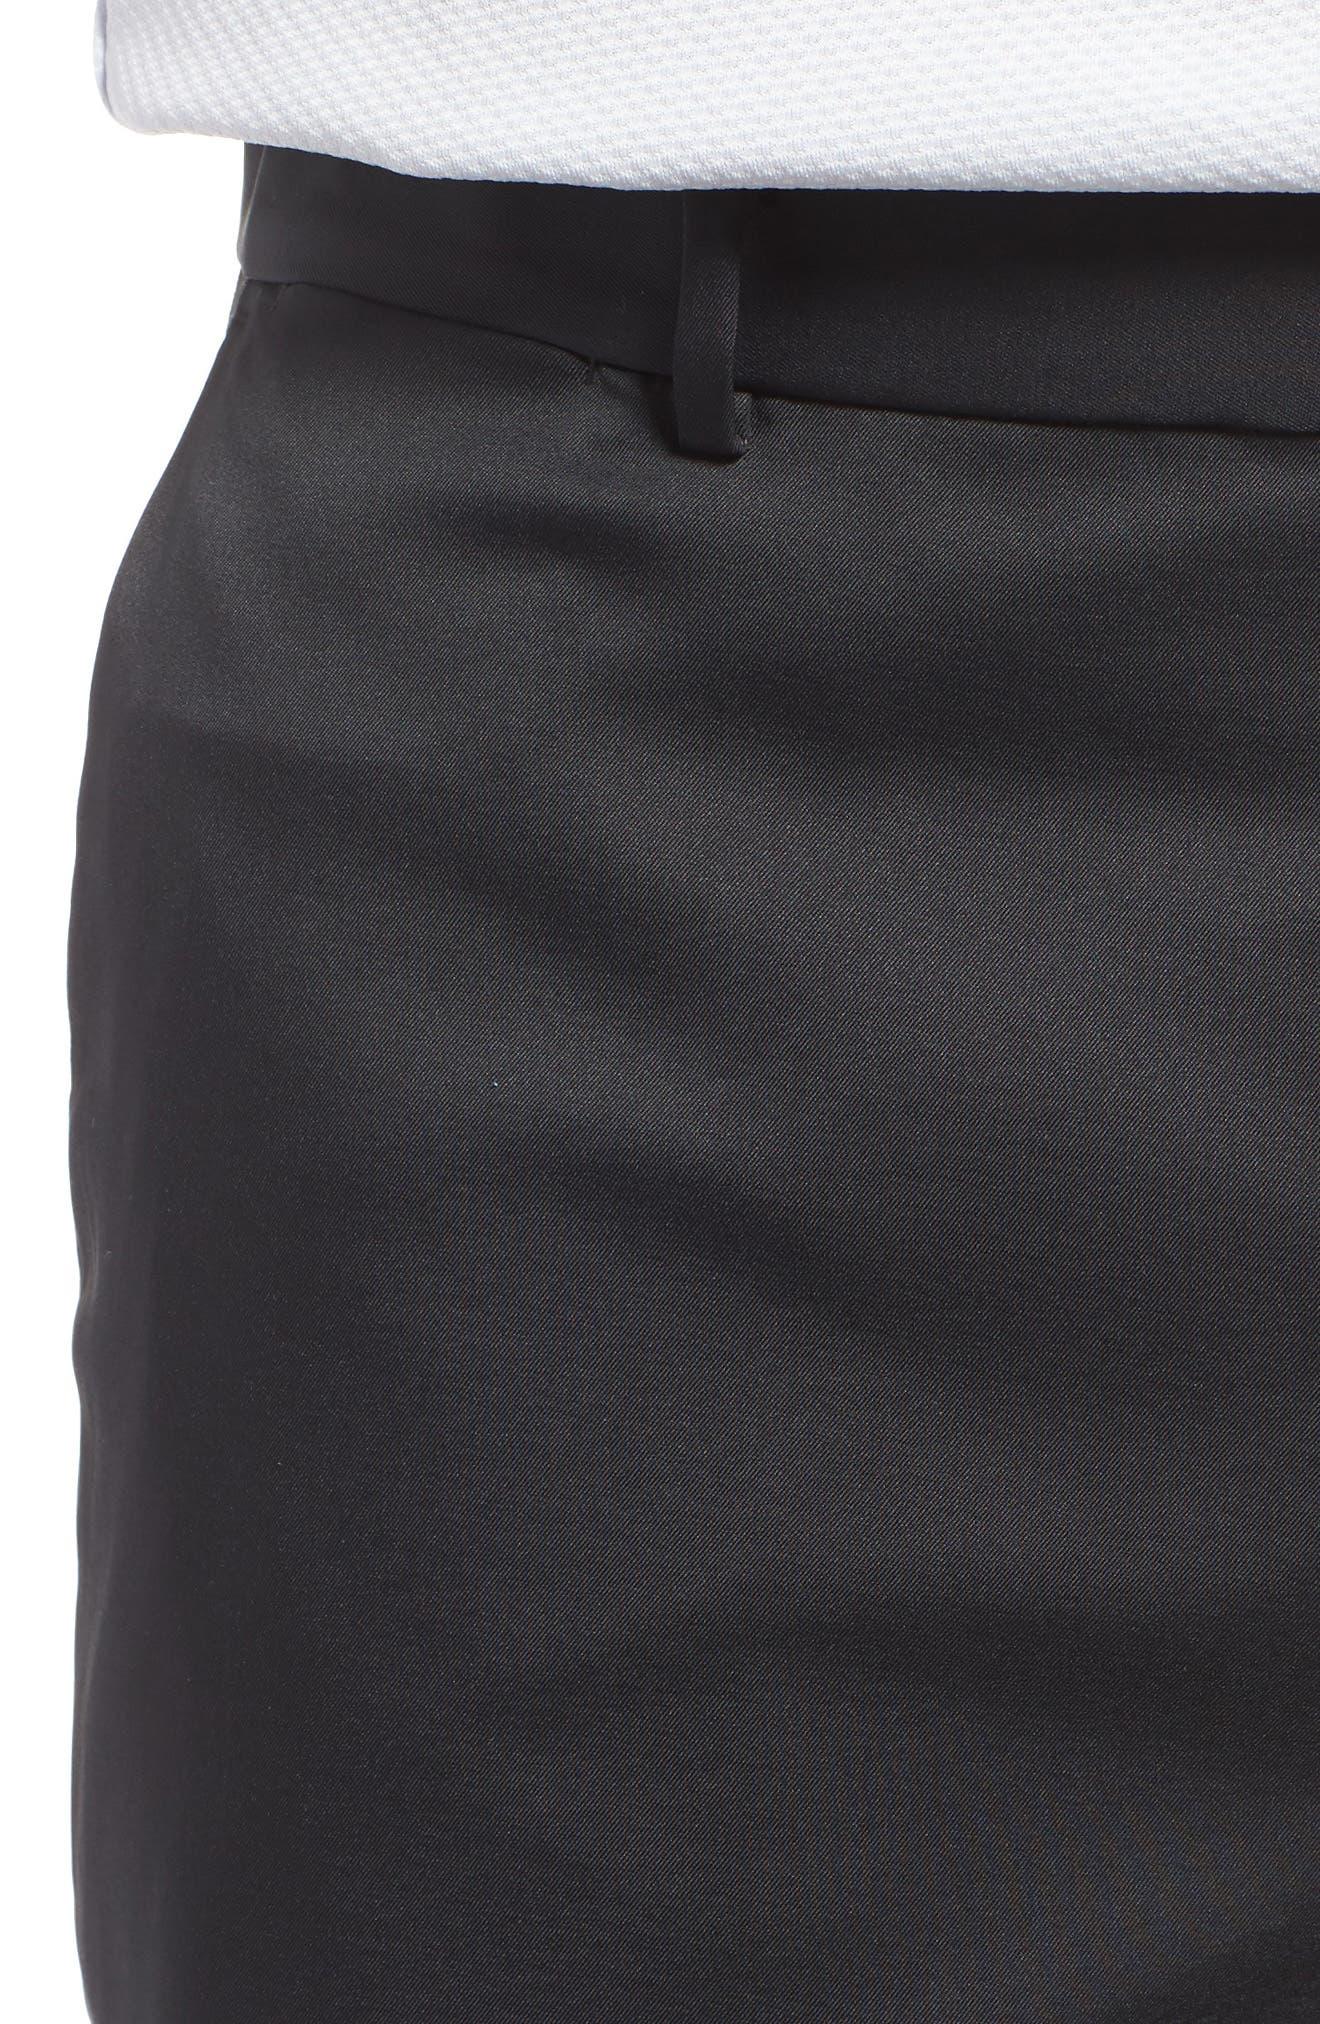 Flat Front Golf Shorts,                             Alternate thumbnail 28, color,